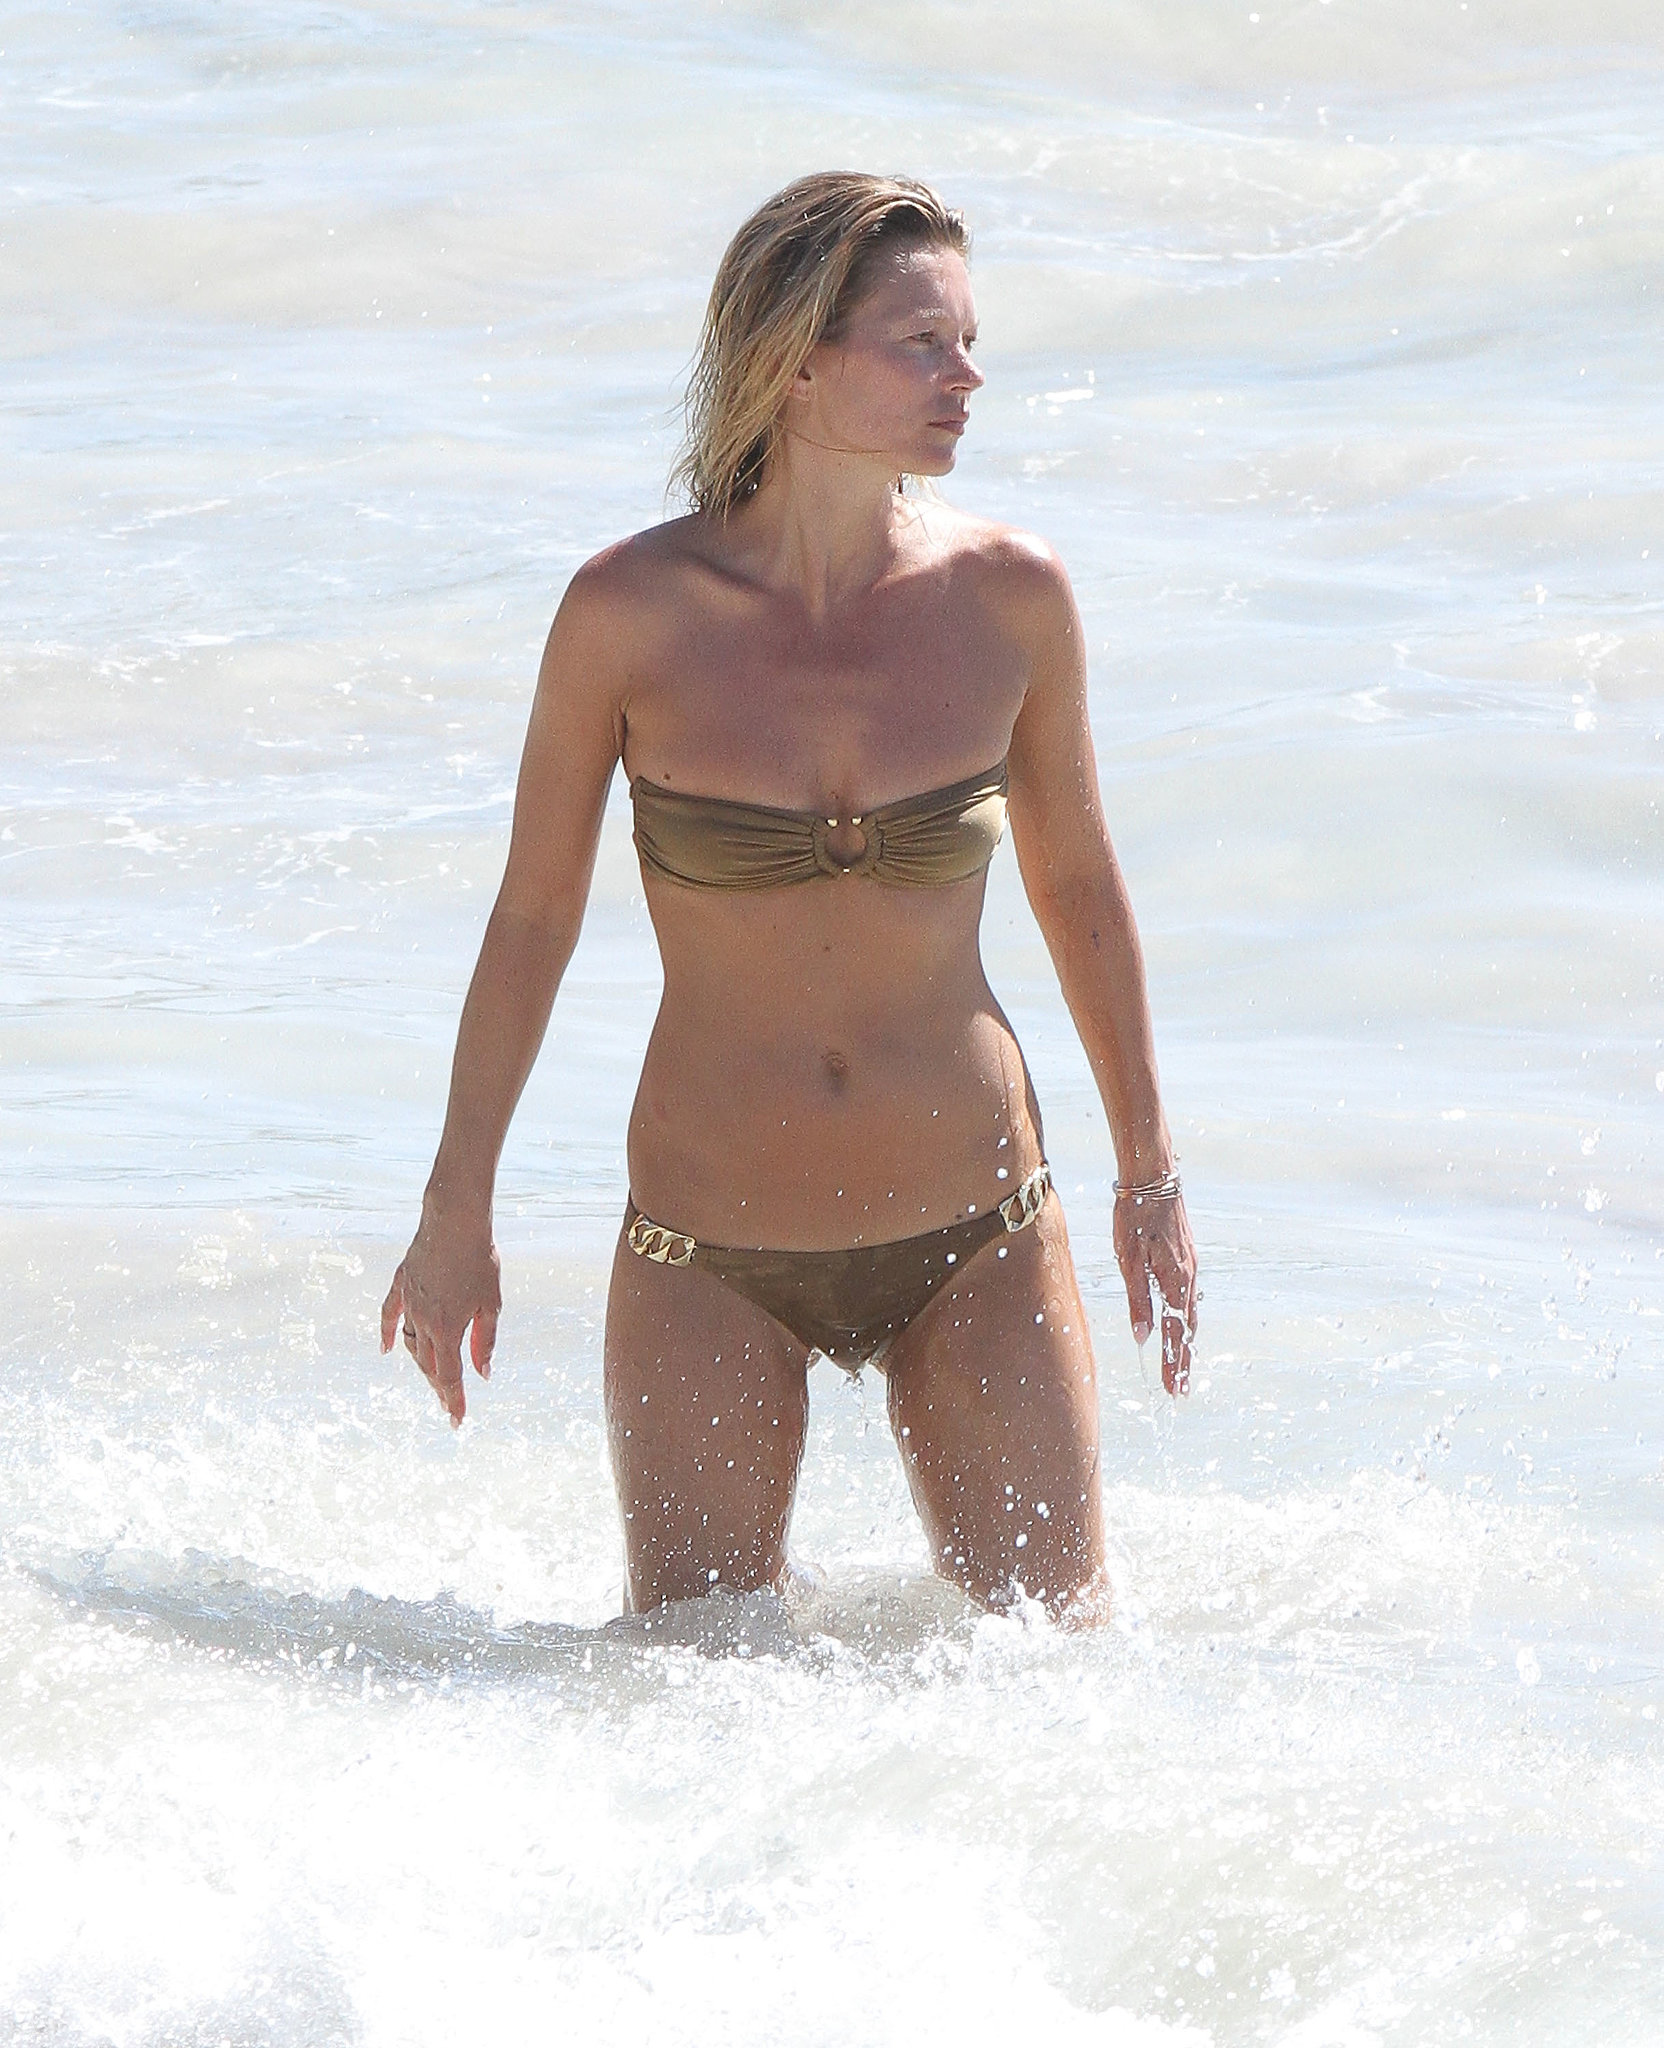 56. Kate Moss